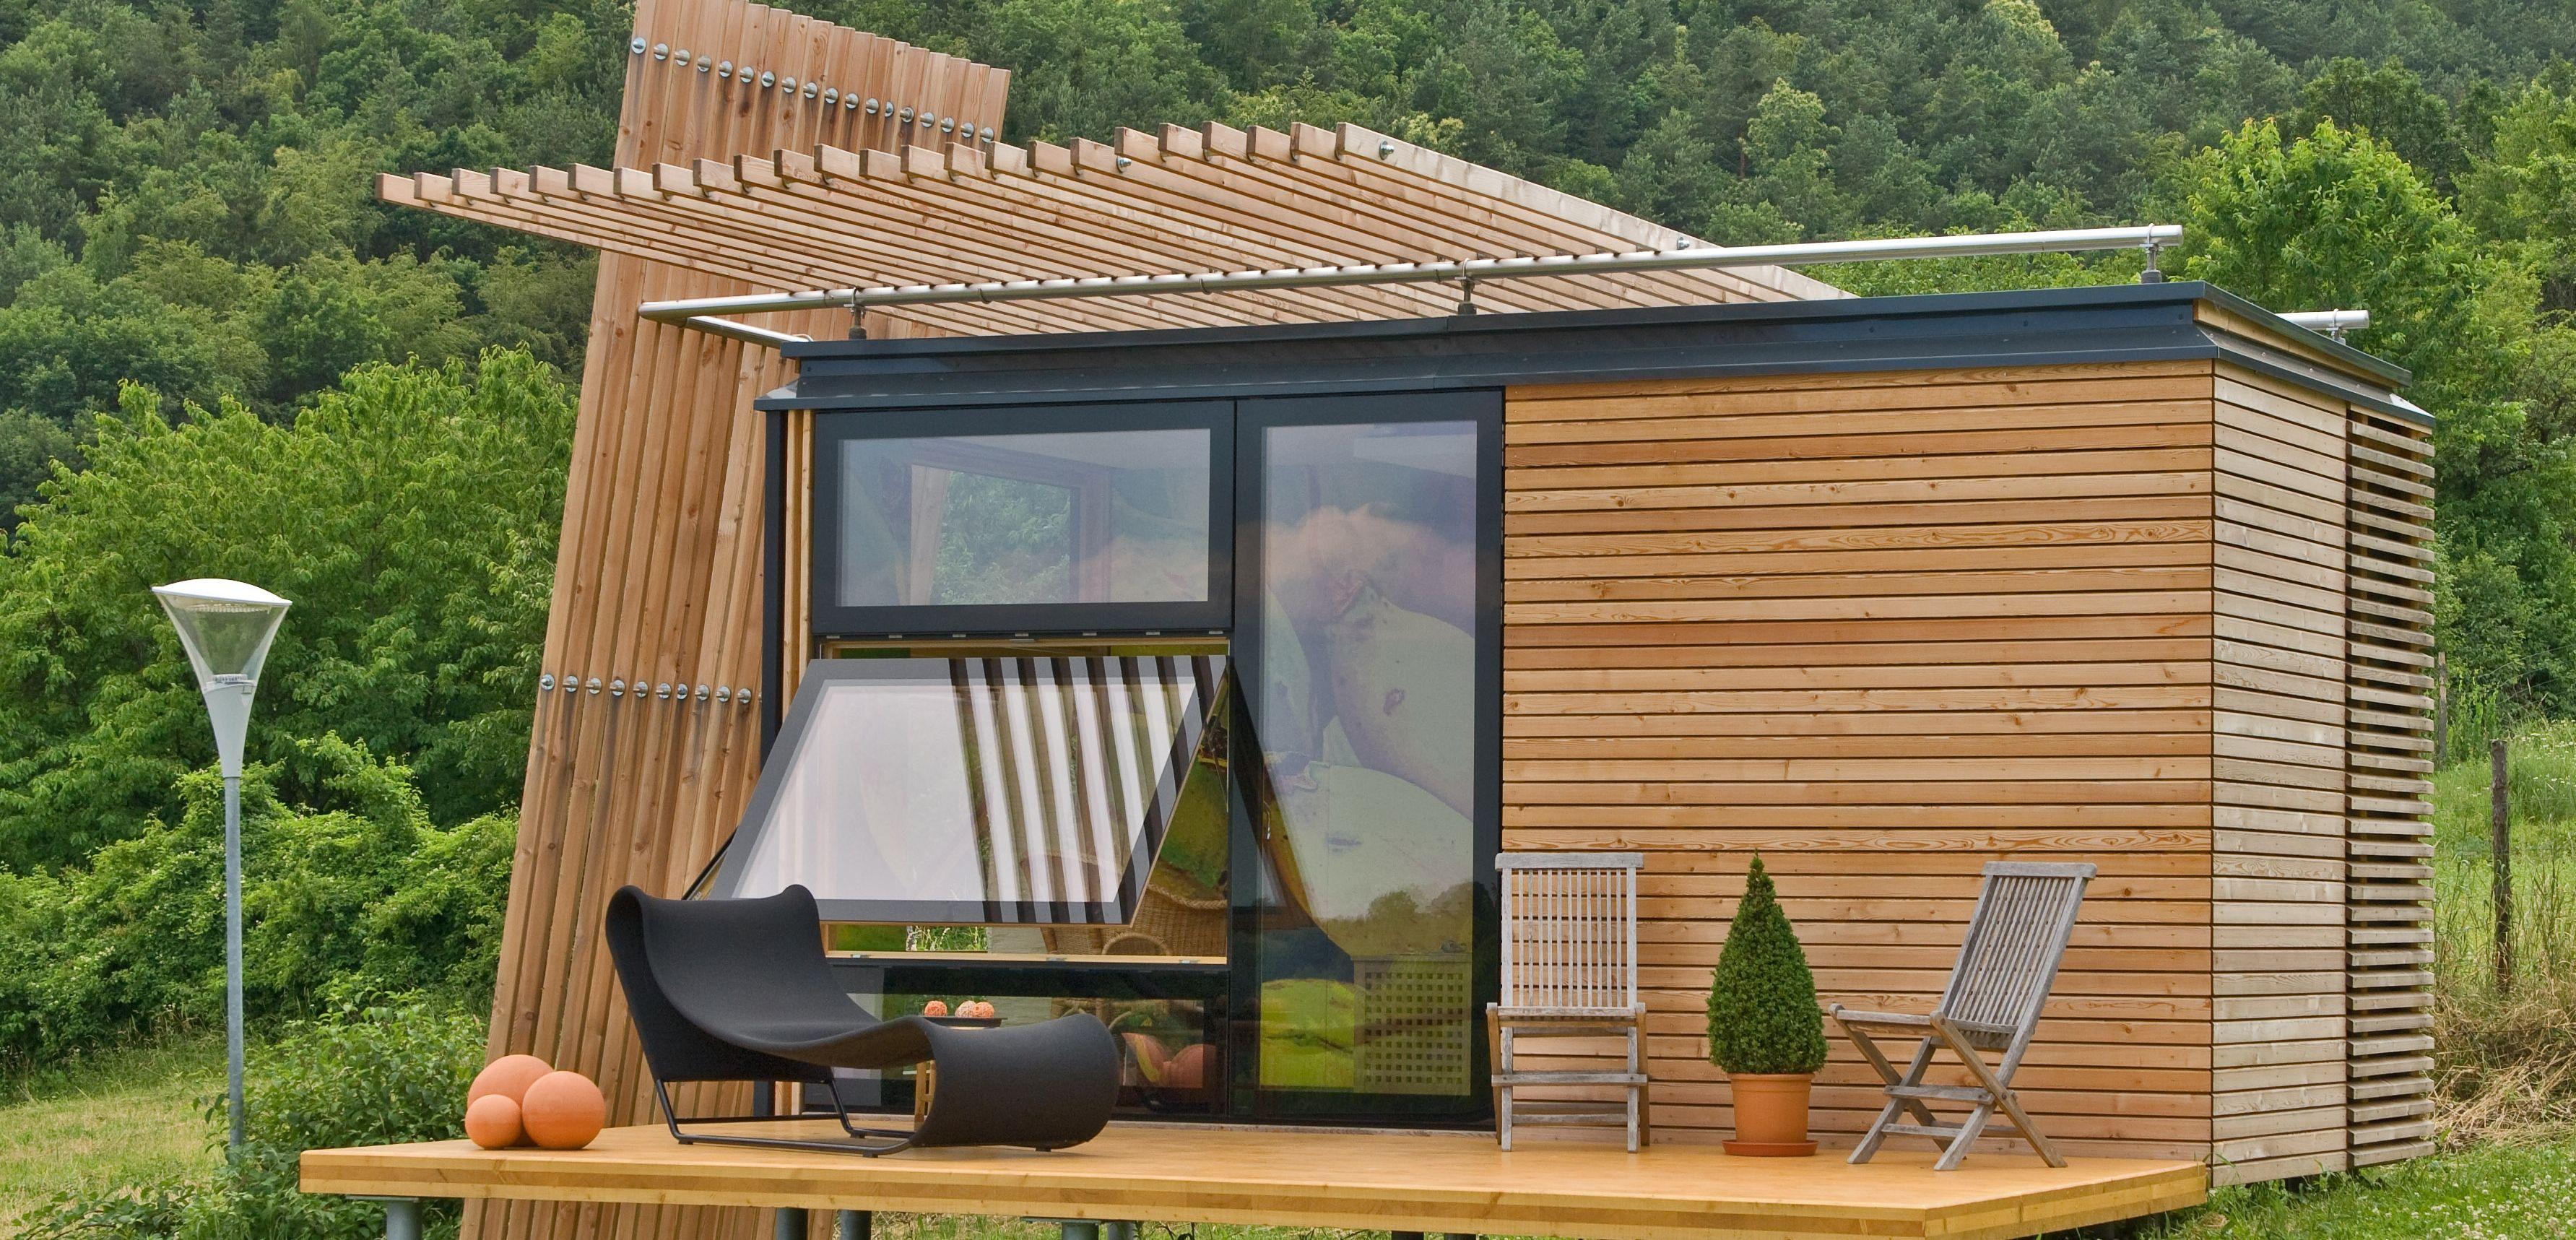 Deko Ideen Gartenlaube Luxus Design Minihaus Eunido Cube4